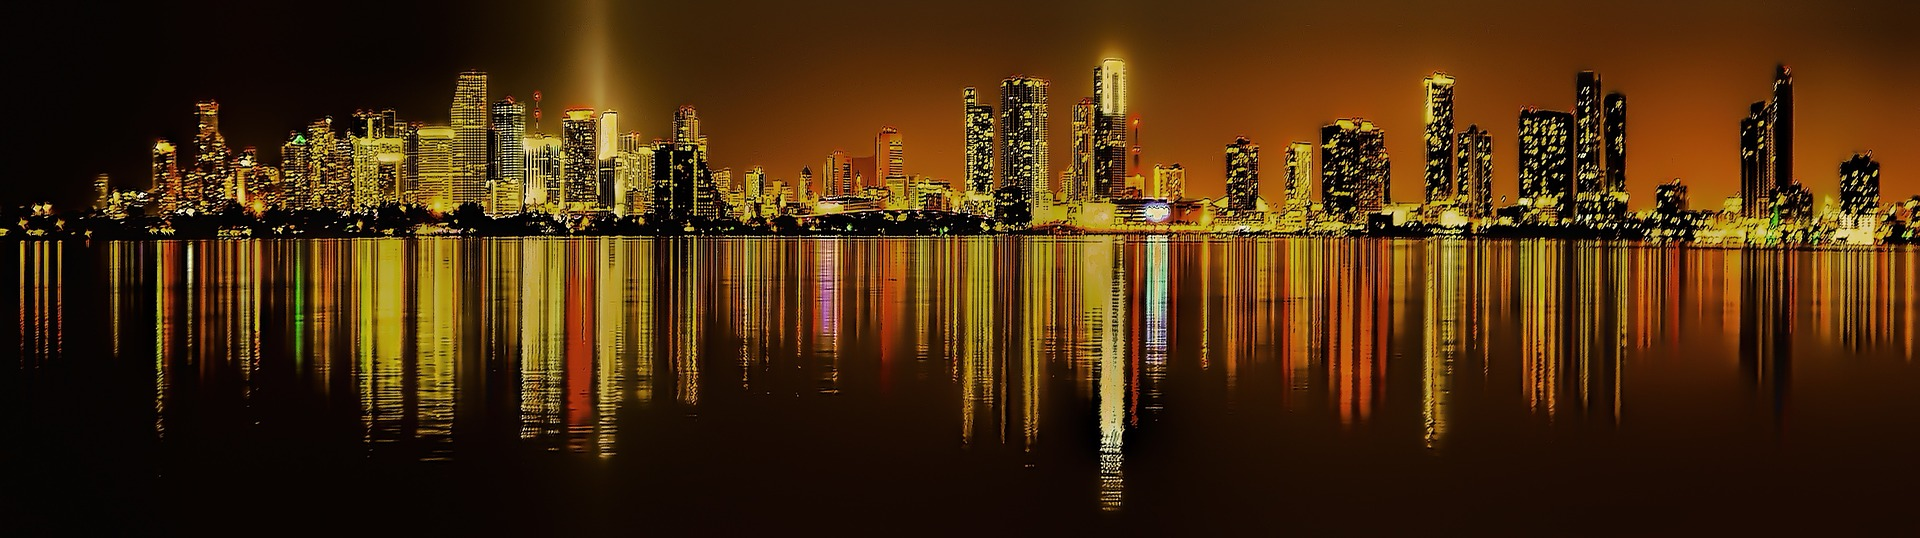 Downtown Miami, Florida at night